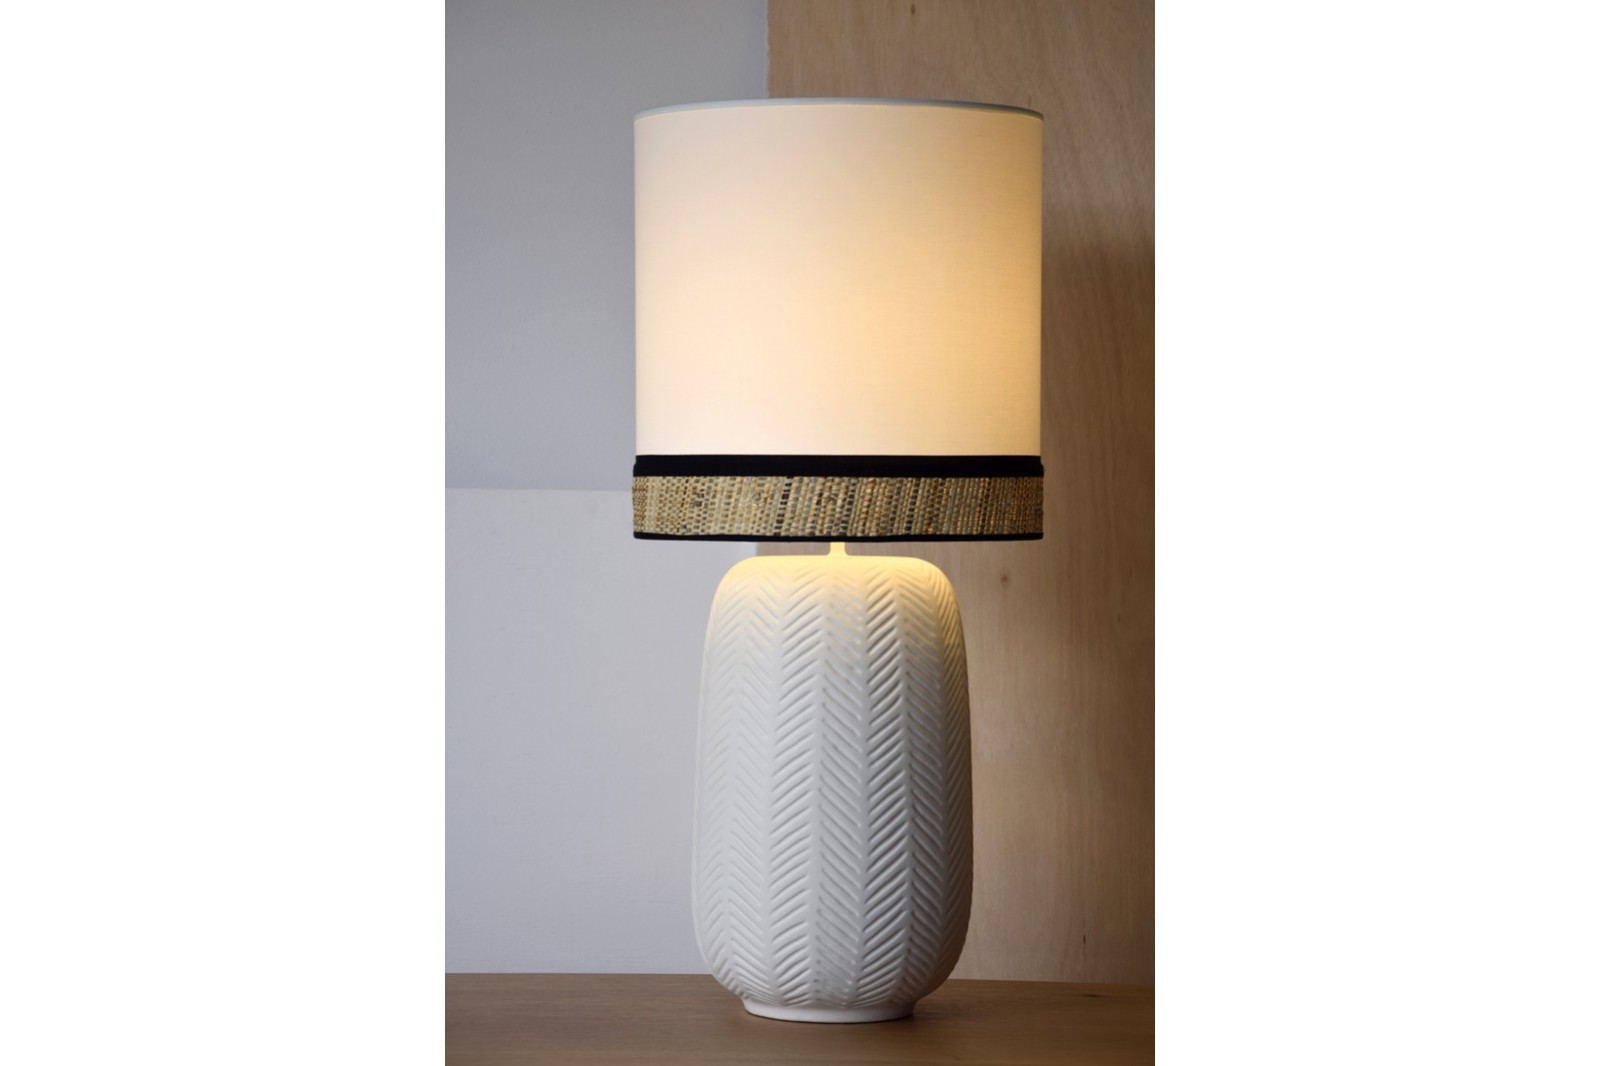 CERAMIC LAMP CLOE W/SHADE.LARGE